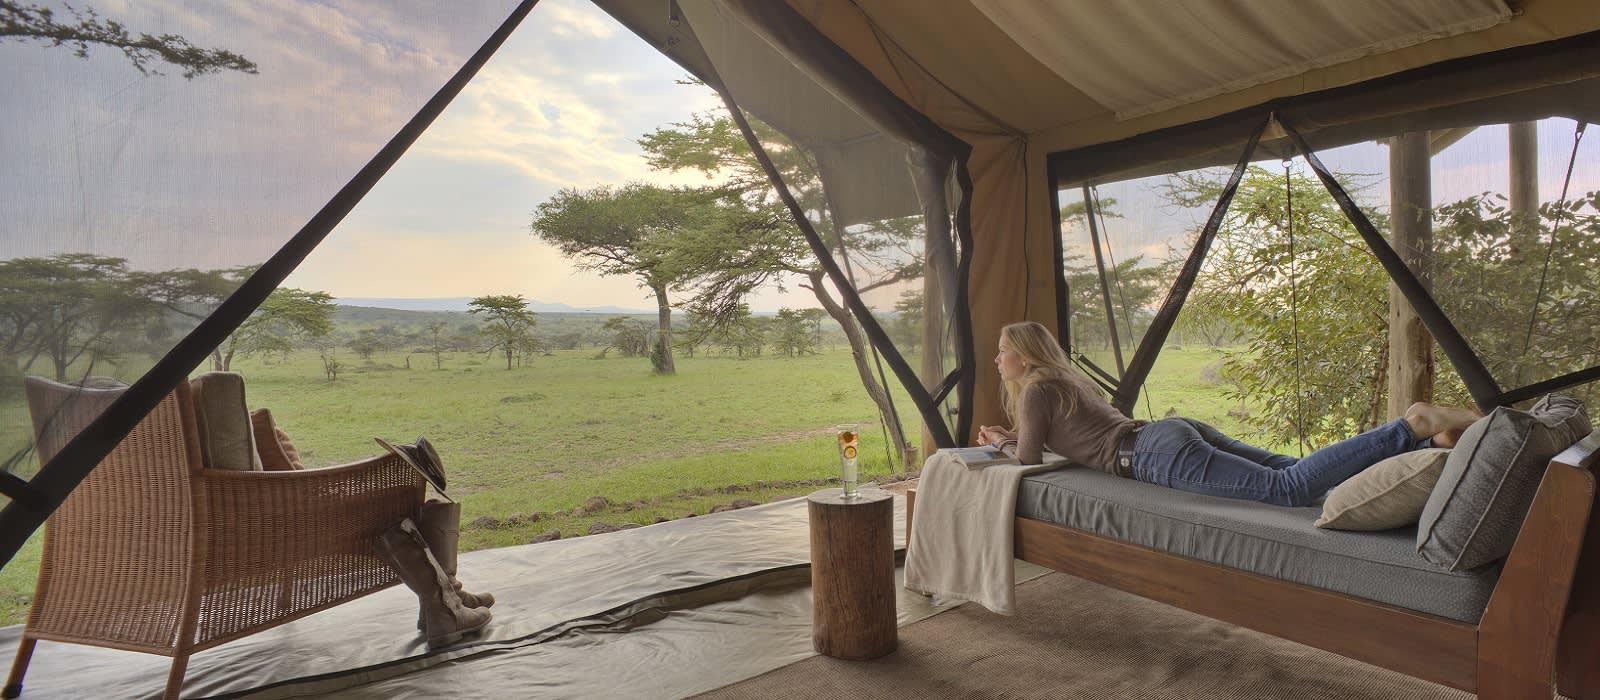 Kenya Tours - Naboisho Camp Masai Mara Guest bedroom tent Interior